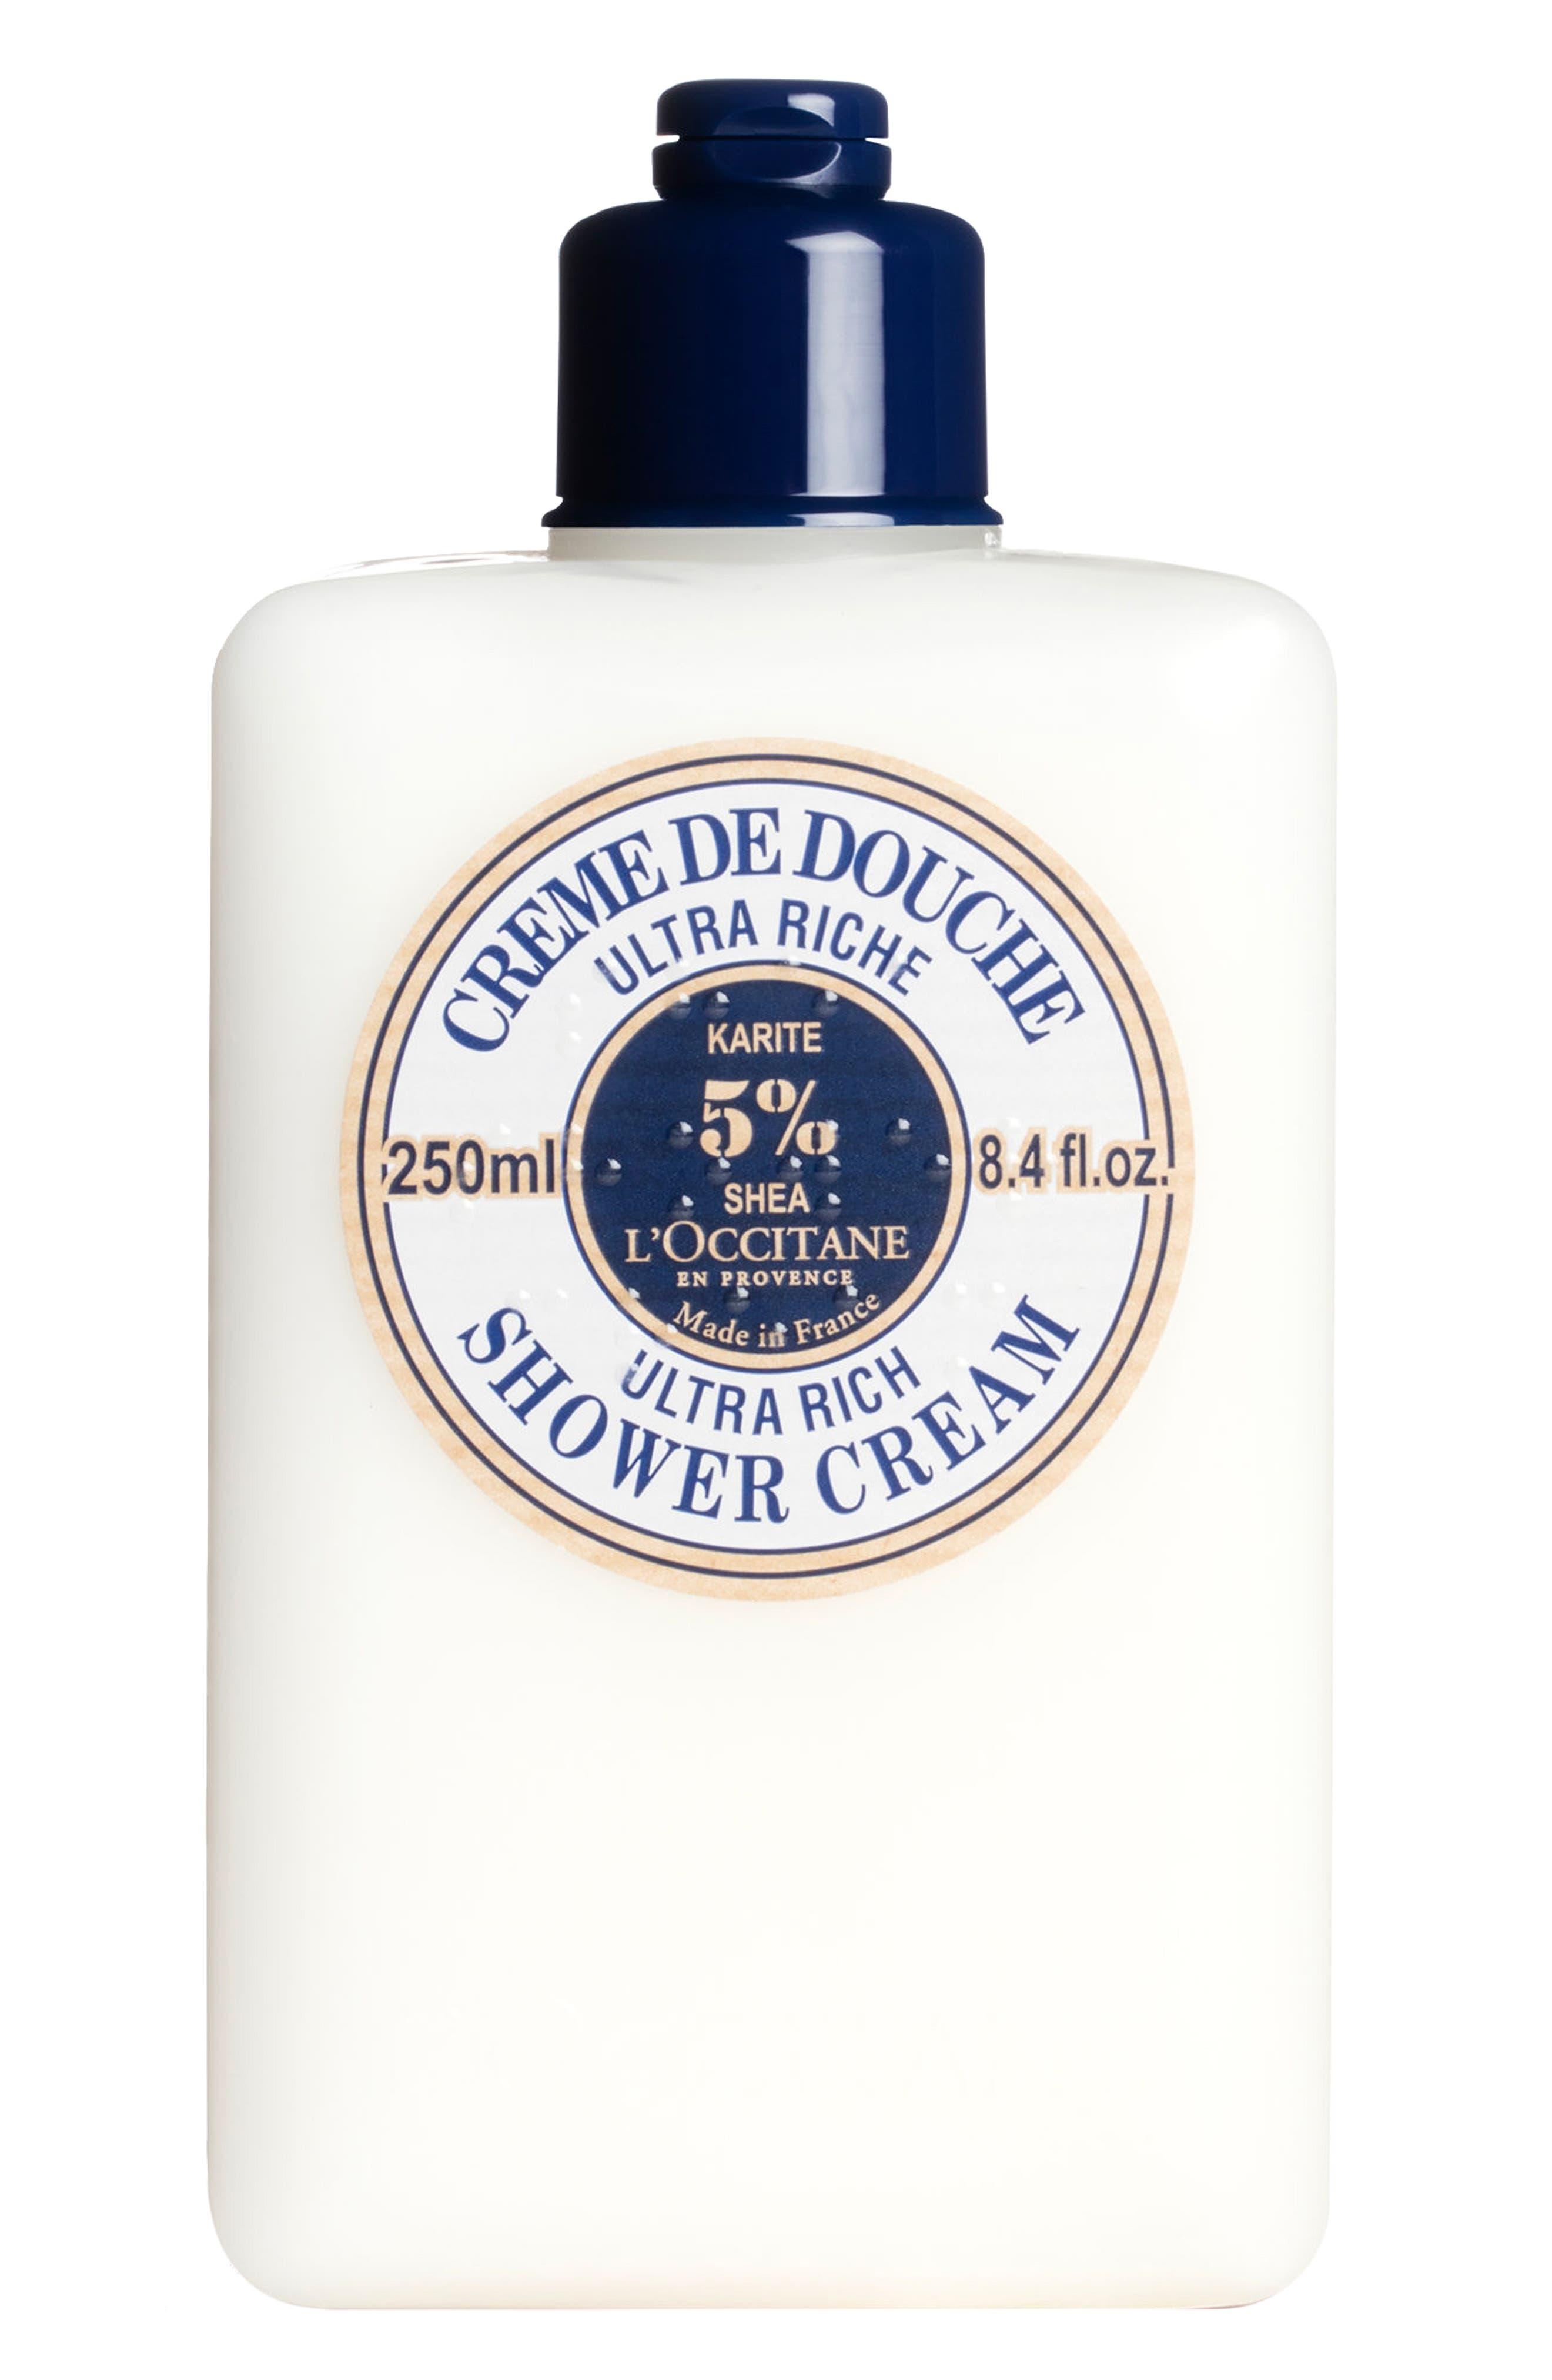 Alternate Image 1 Selected - L'Occitane Ultra Rich Shower Cream